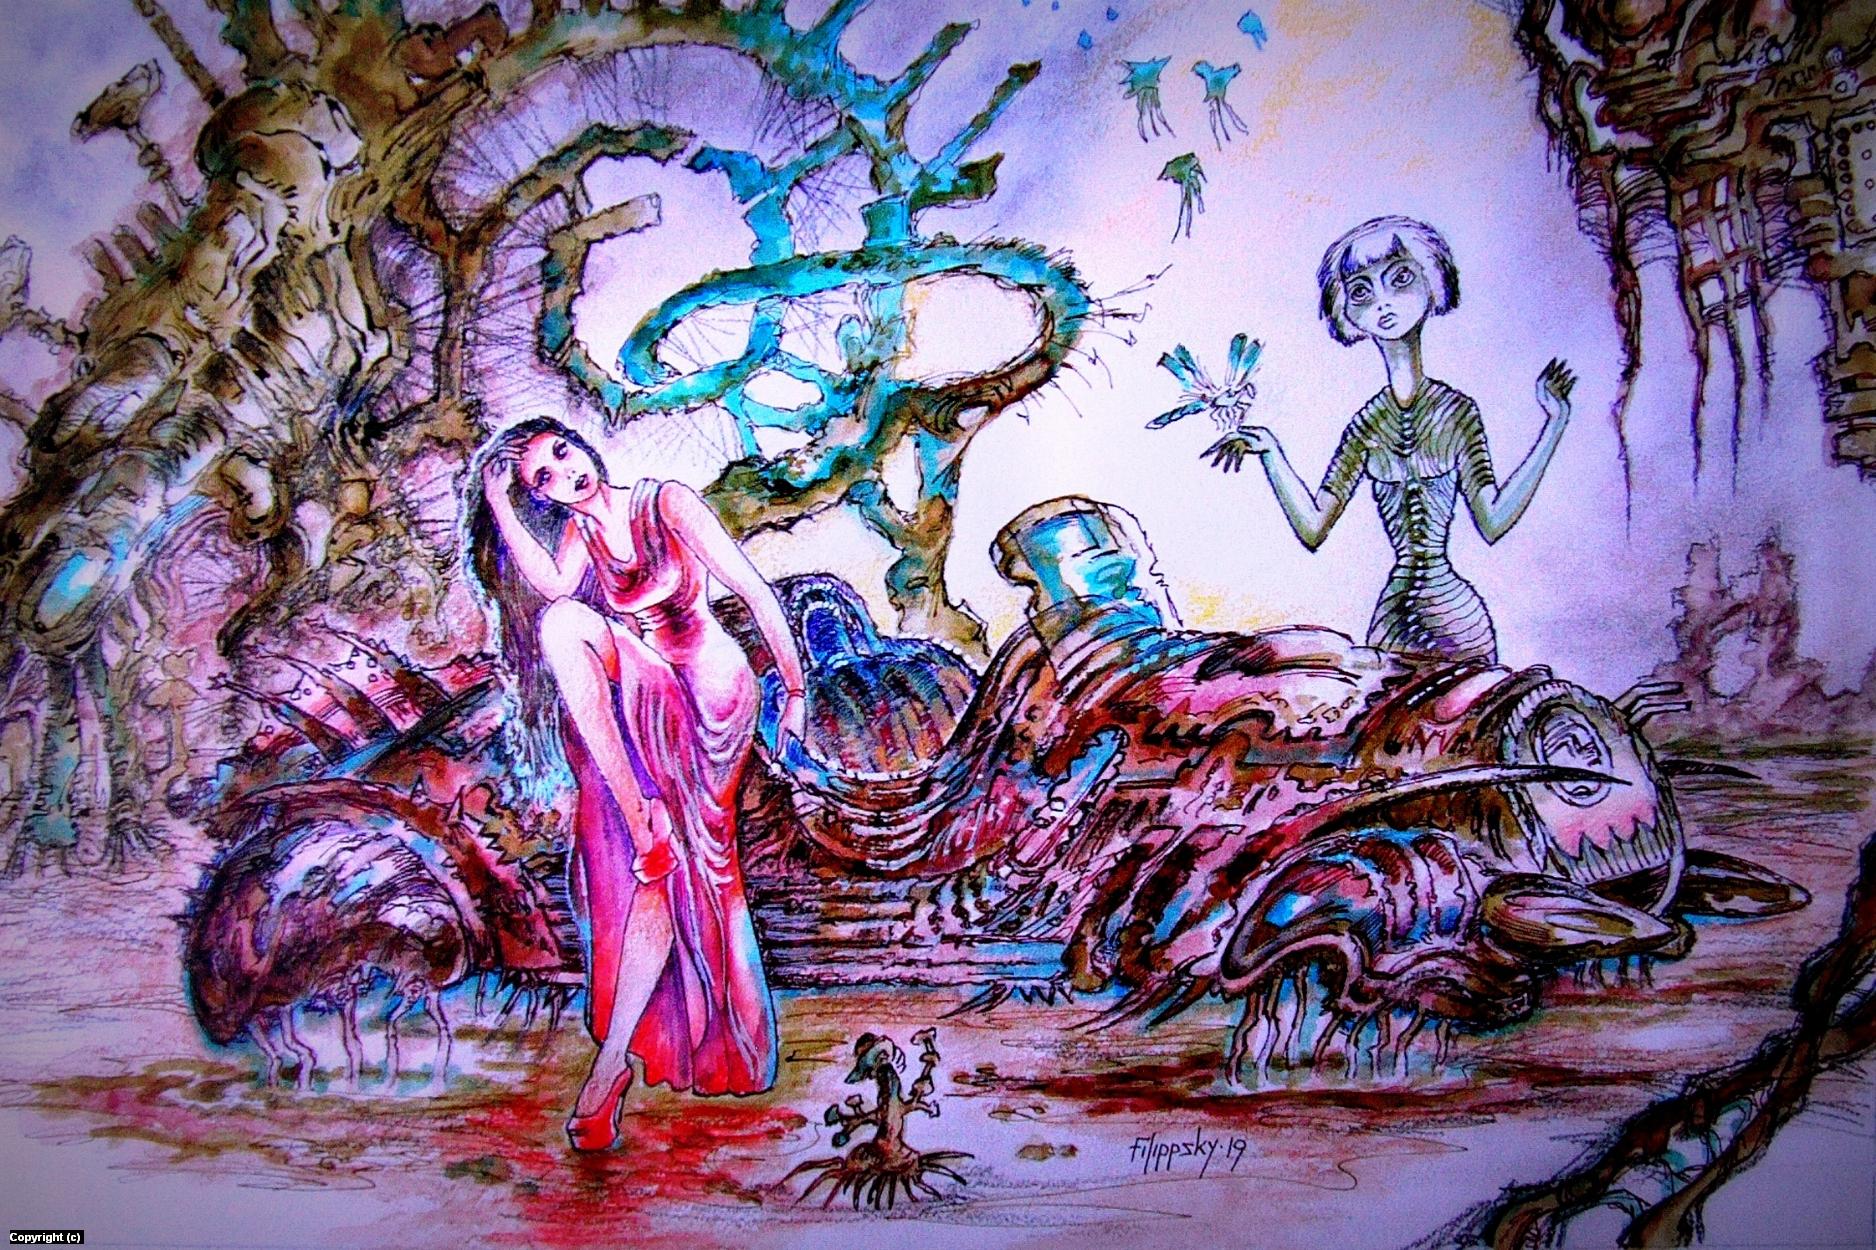 Aliencar. Artwork by Victor Filippsky